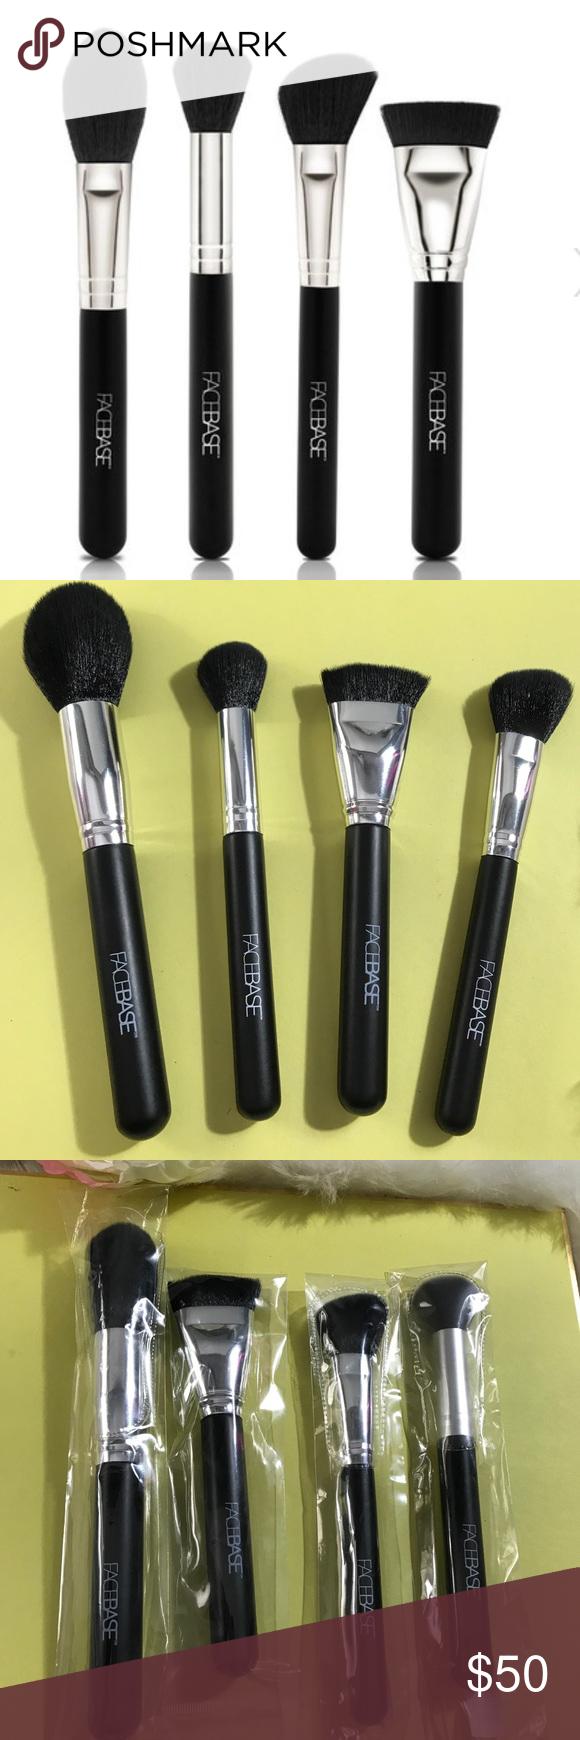 Facebase contour brushes x4 PRO high quality Professional